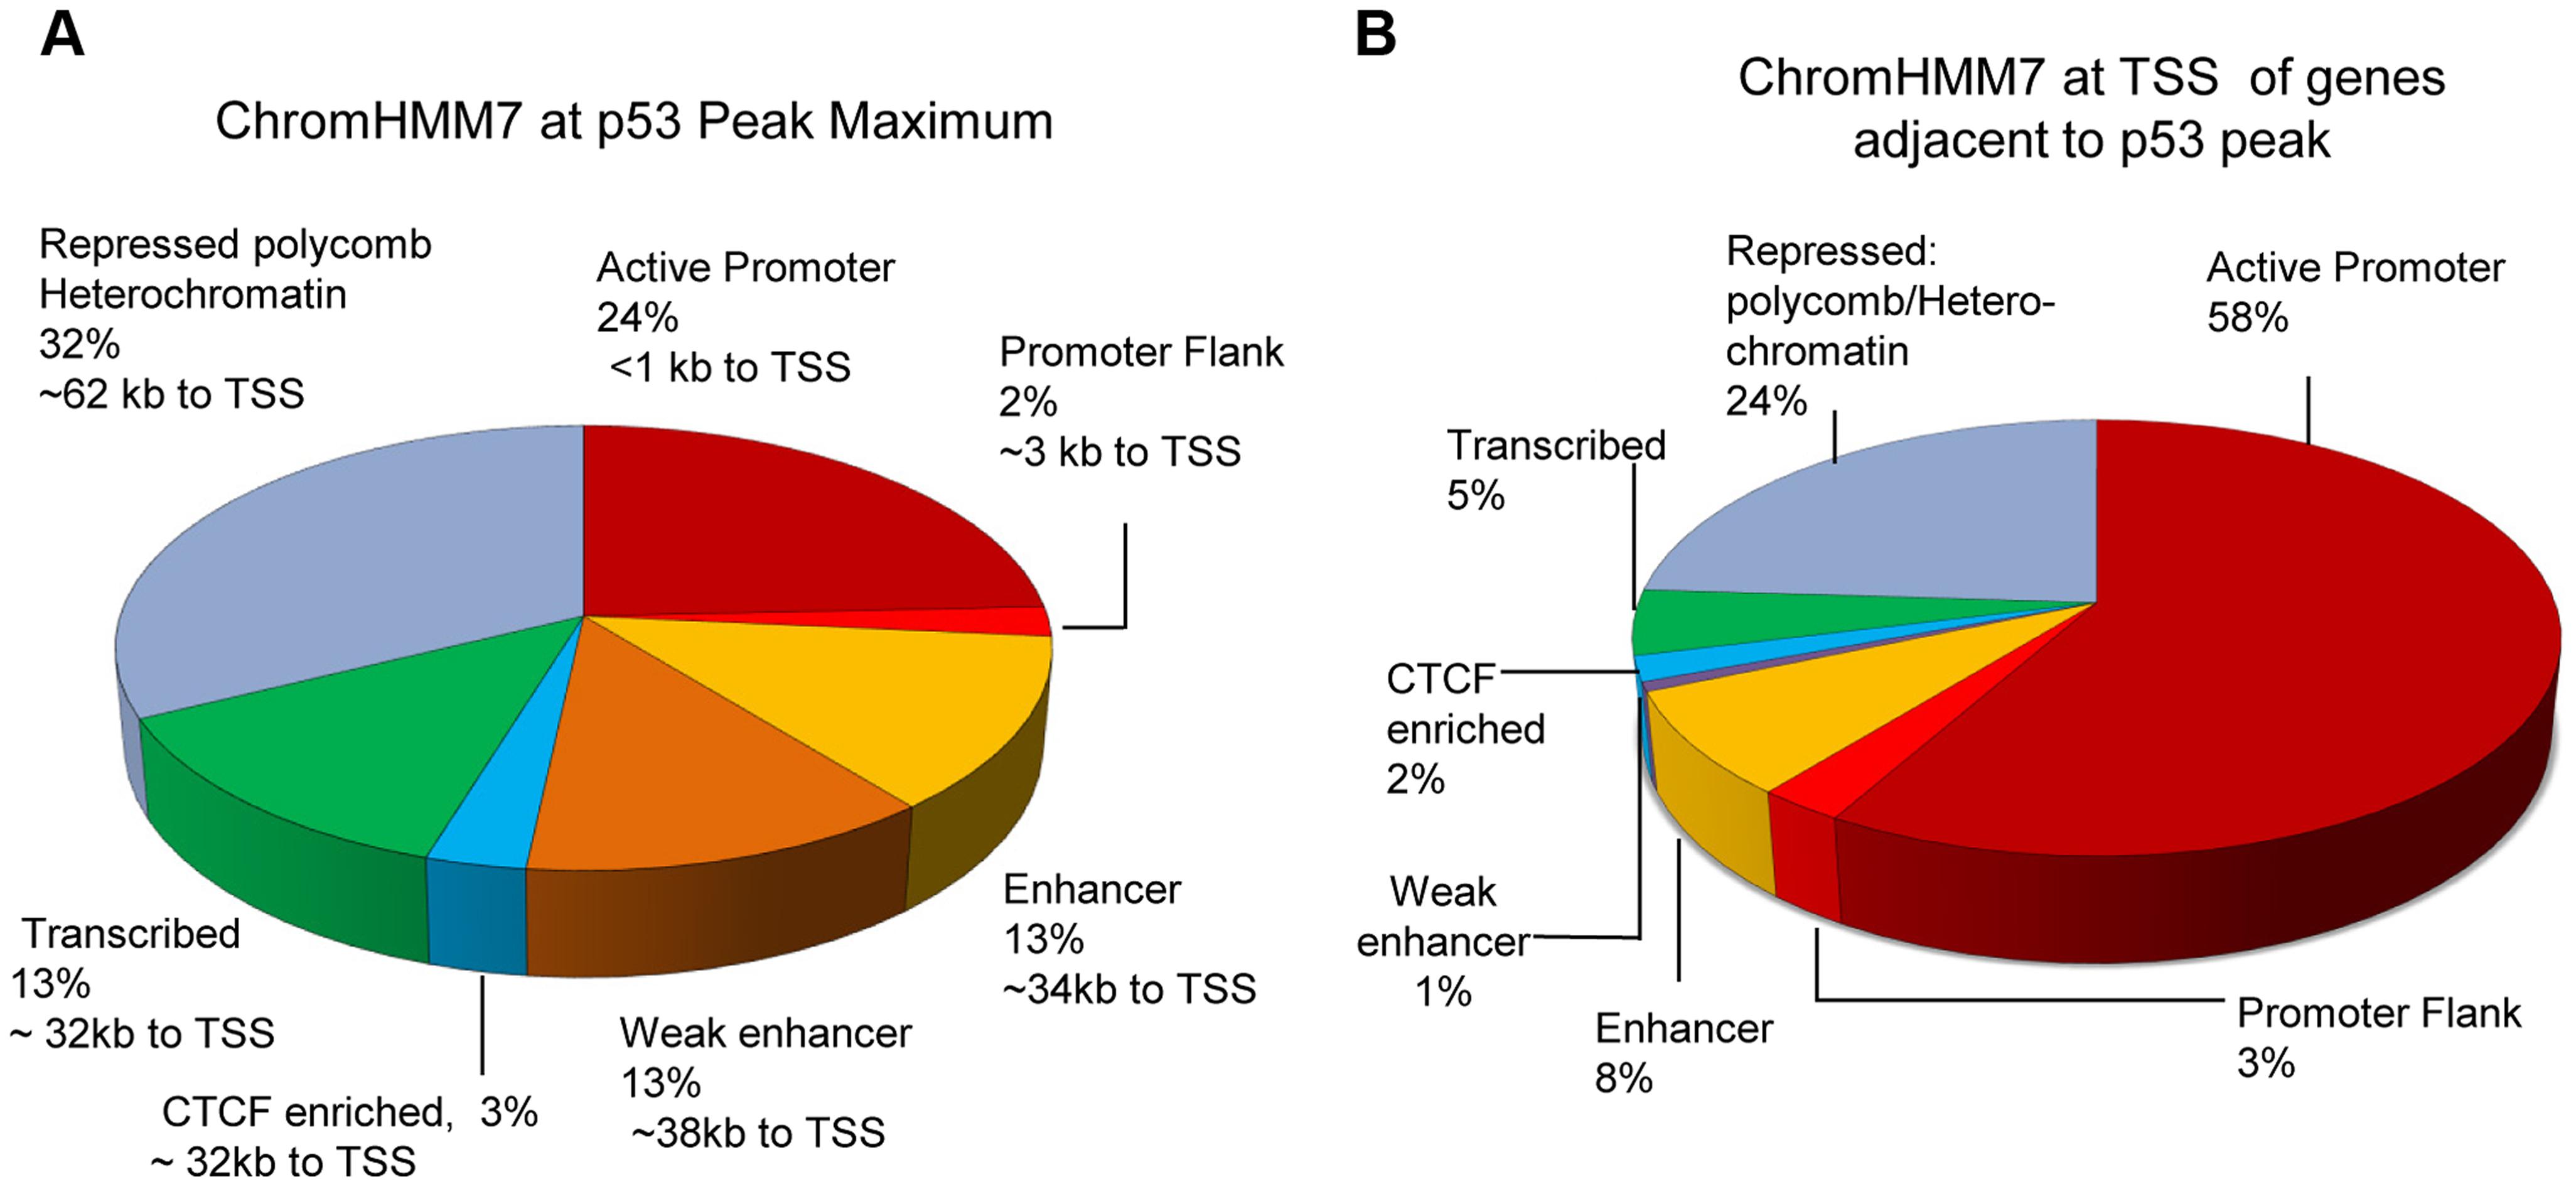 Distribution of p53 peaks among ENCODE combined chromatin states.